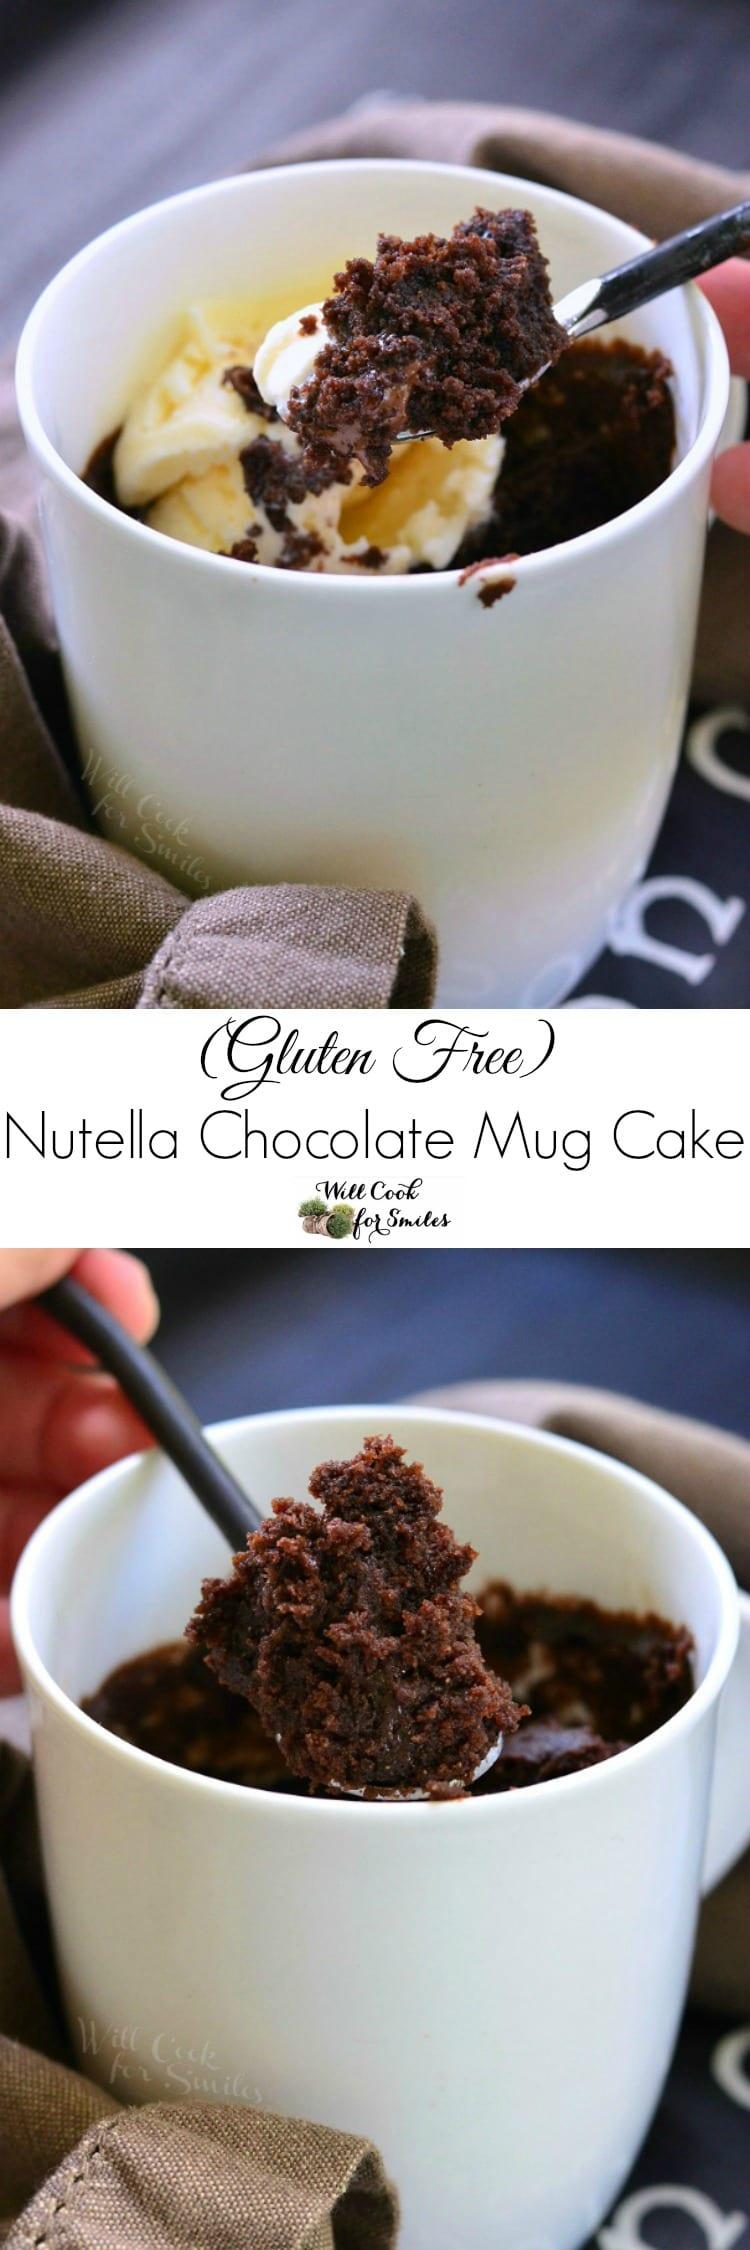 GF Nutella Chocolate Mug Cake (Gluten Free Mug Cake). Individual chocolate cake made in just 5 minutes!